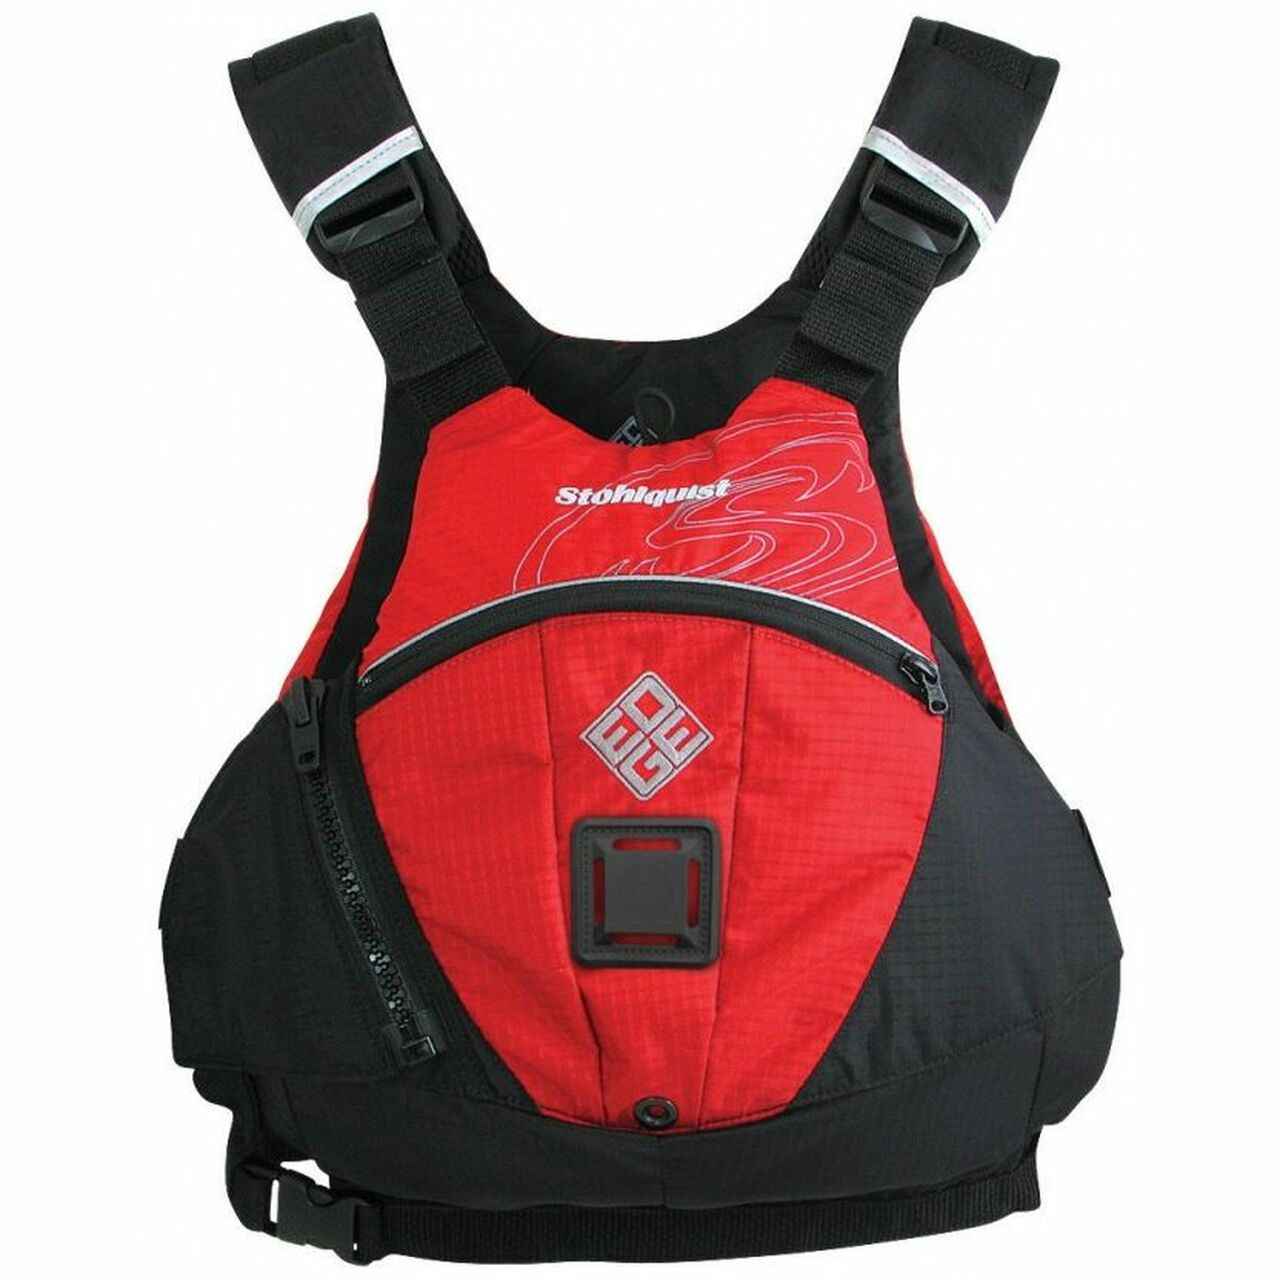 stohlquist-edge-red-1-10972.1563312617.jpg